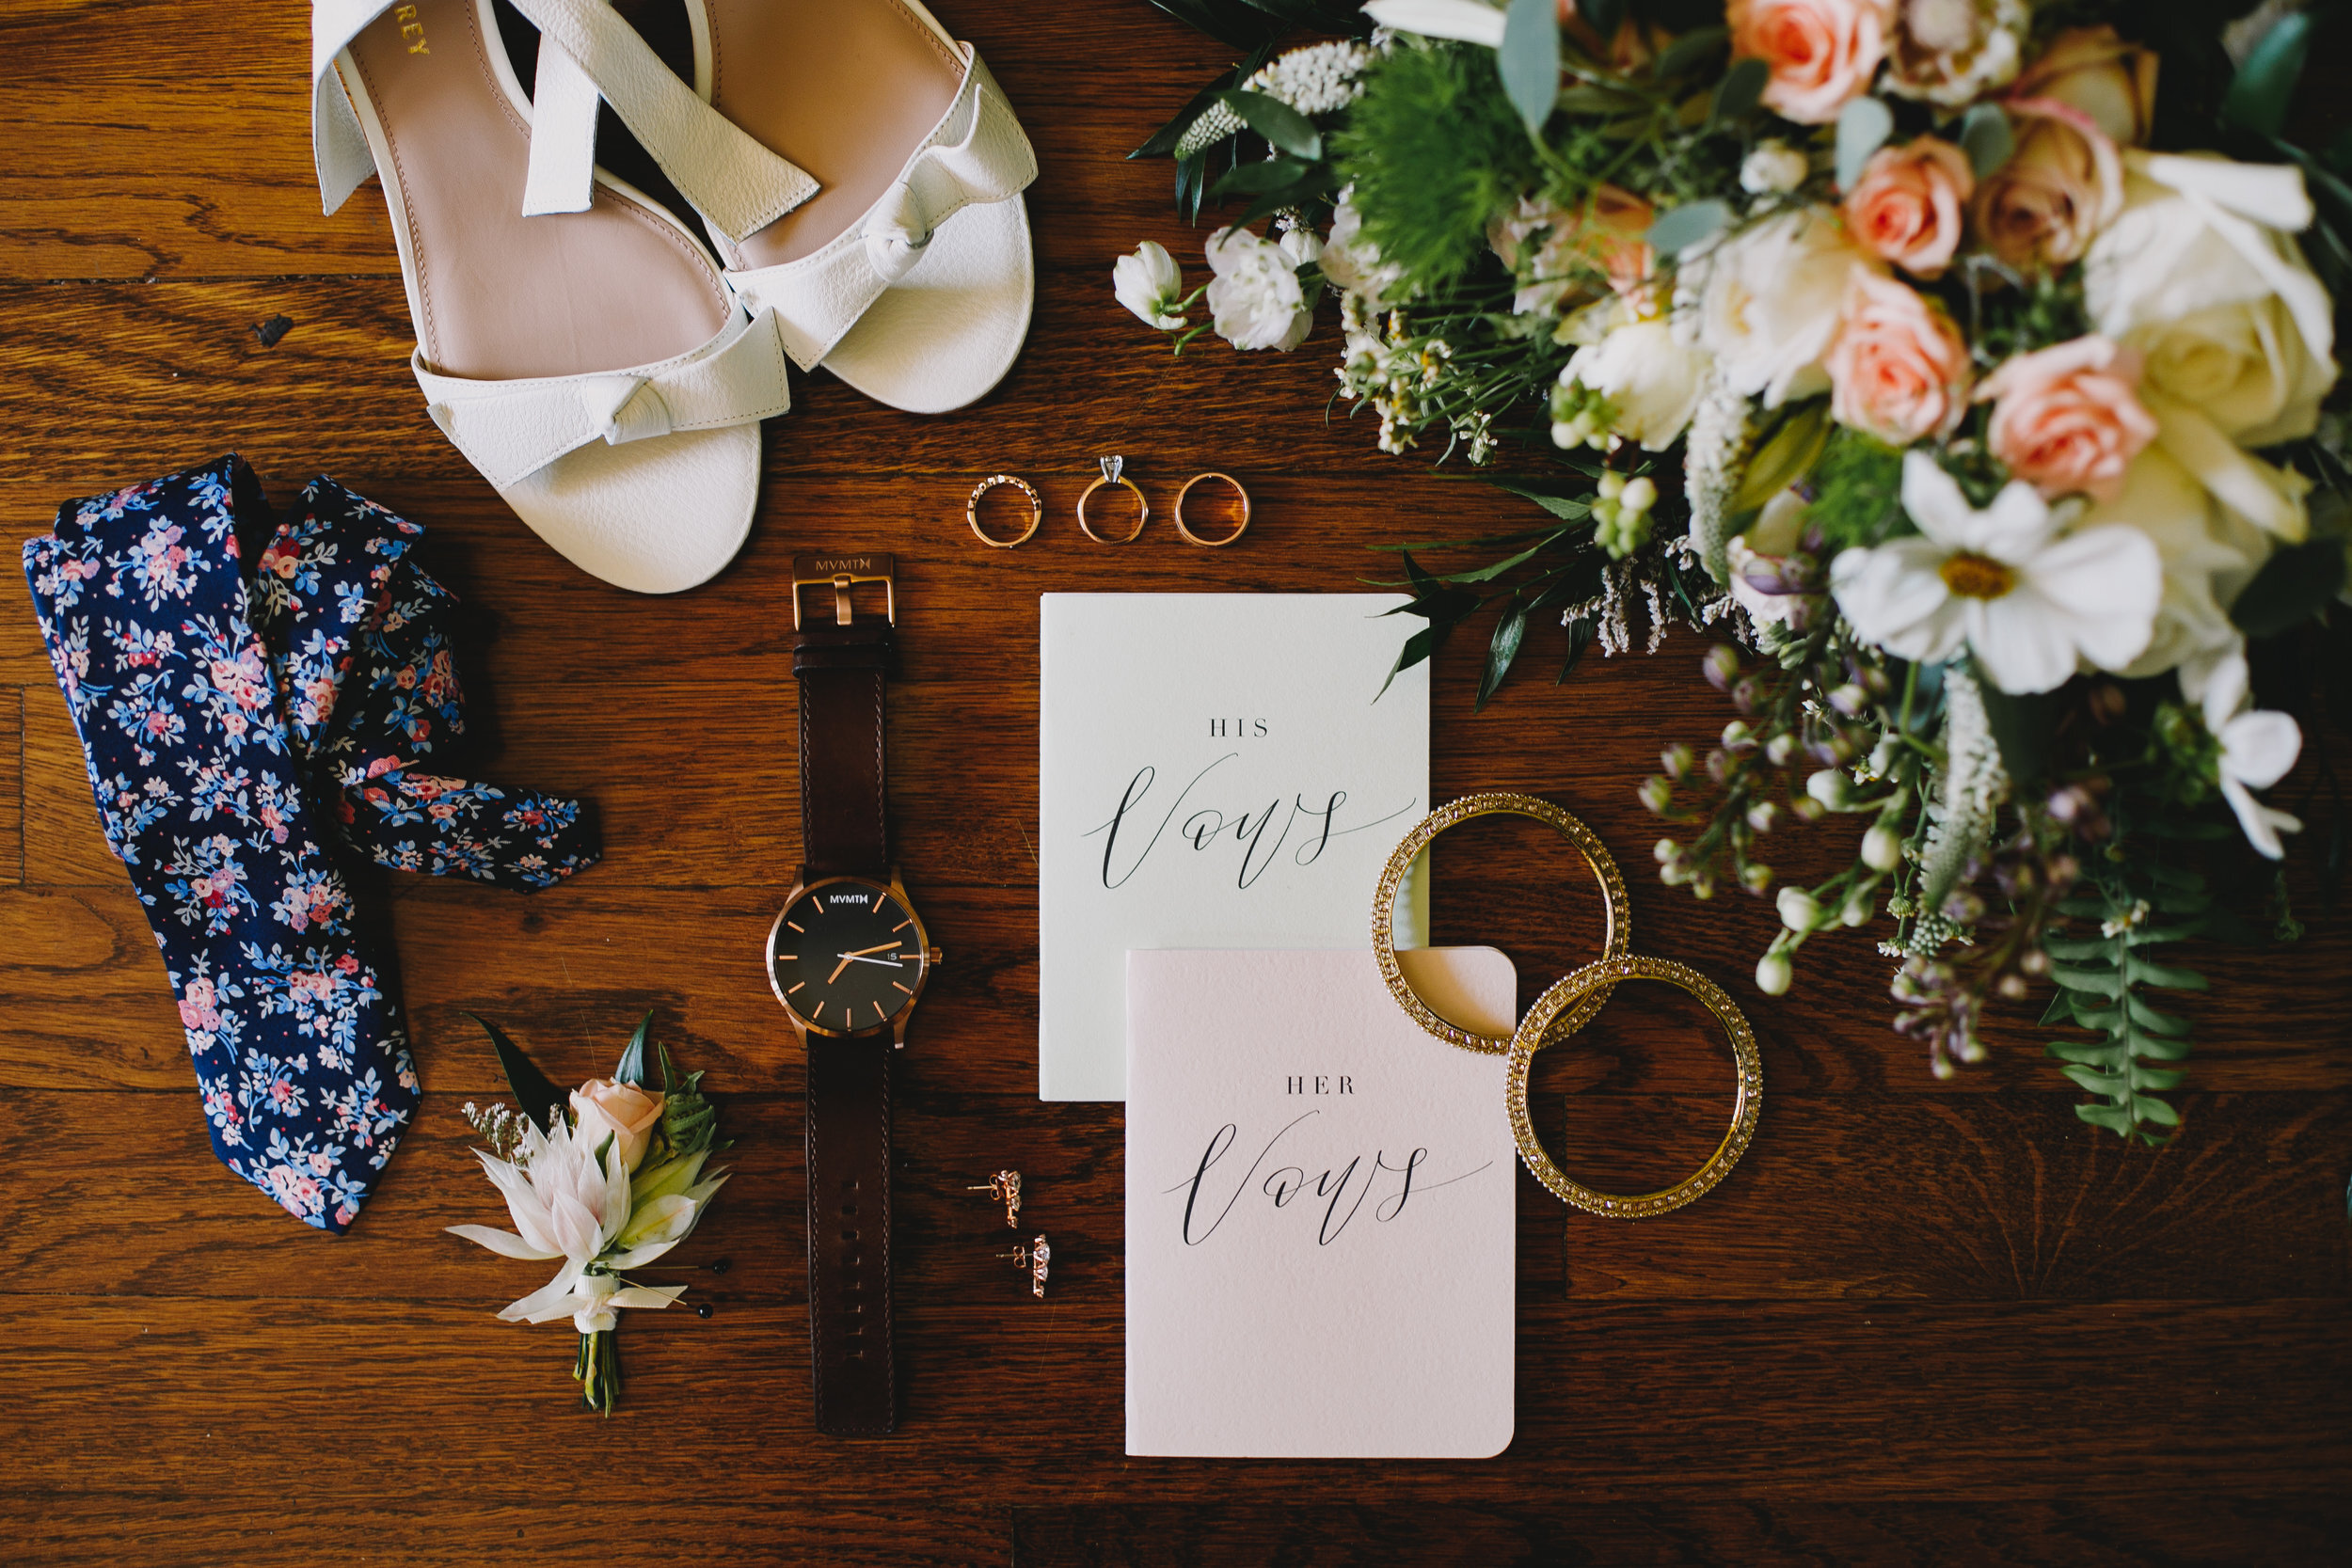 Archer+Inspired+Photography+Long+Beach+Wedding+Engagement+SoCal+Photographer+Detail+Flat+Lay+Shot.jpg